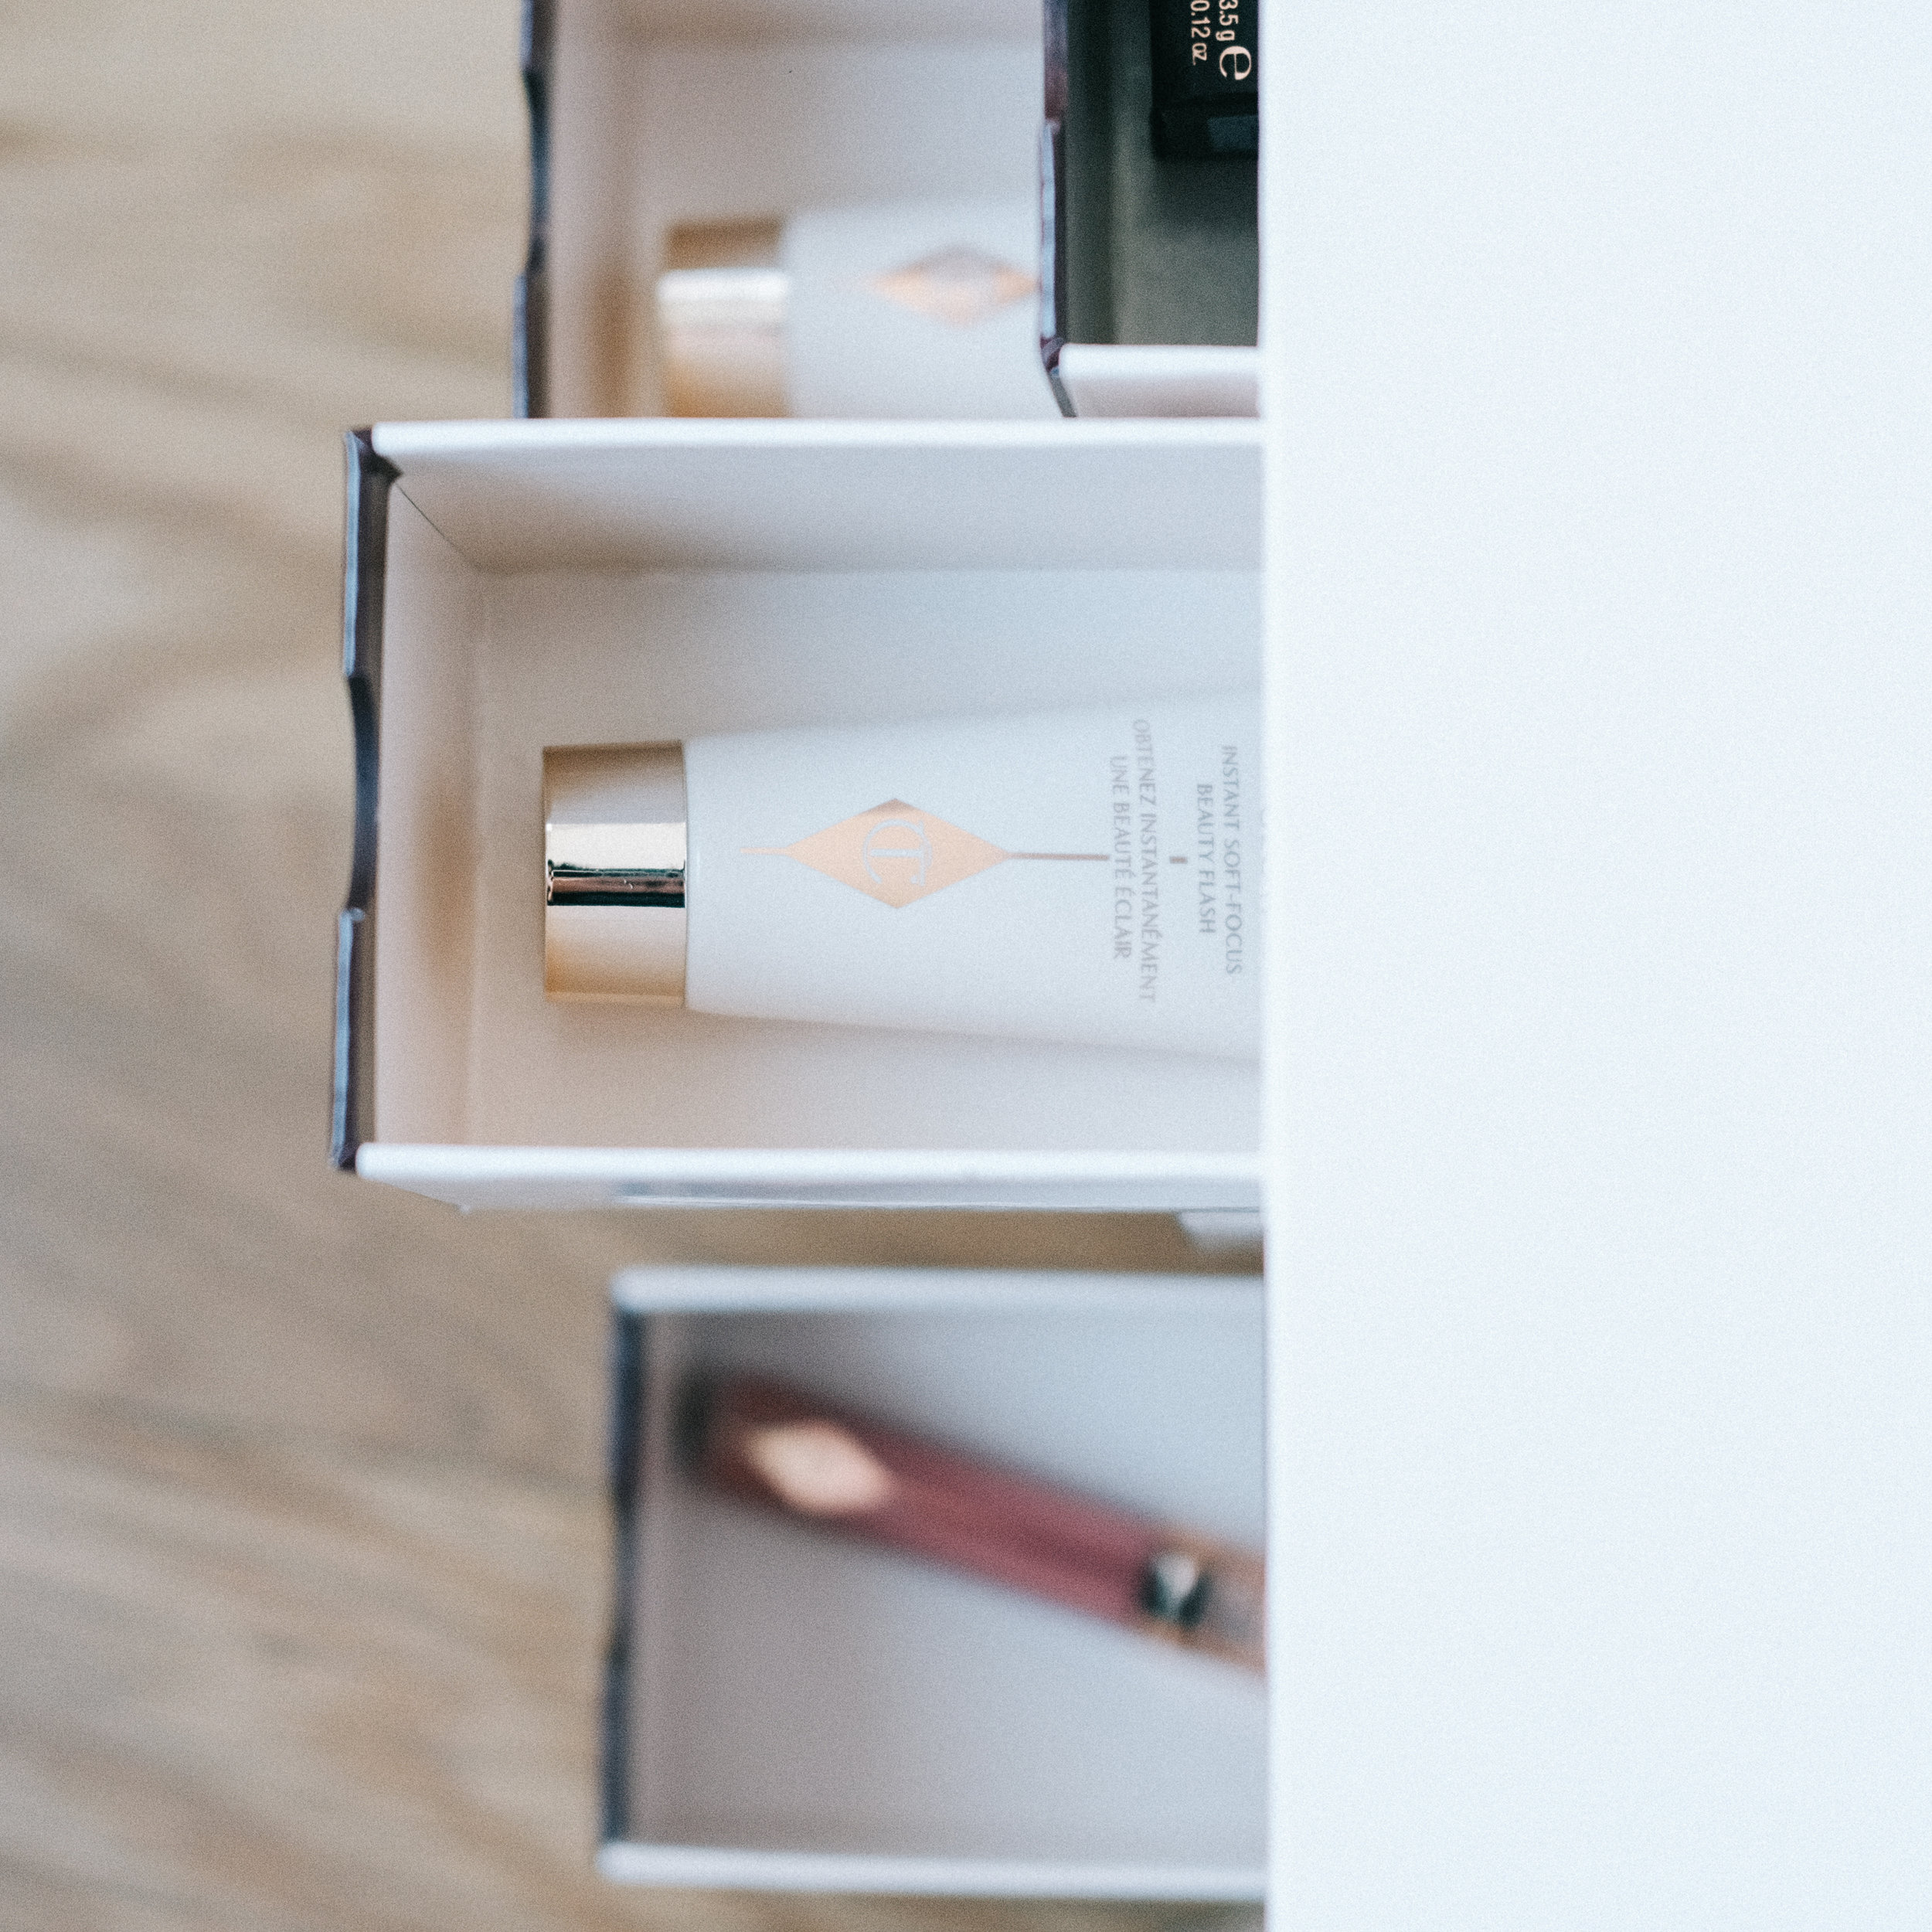 charlotte_tilbury_makeup_gift_set